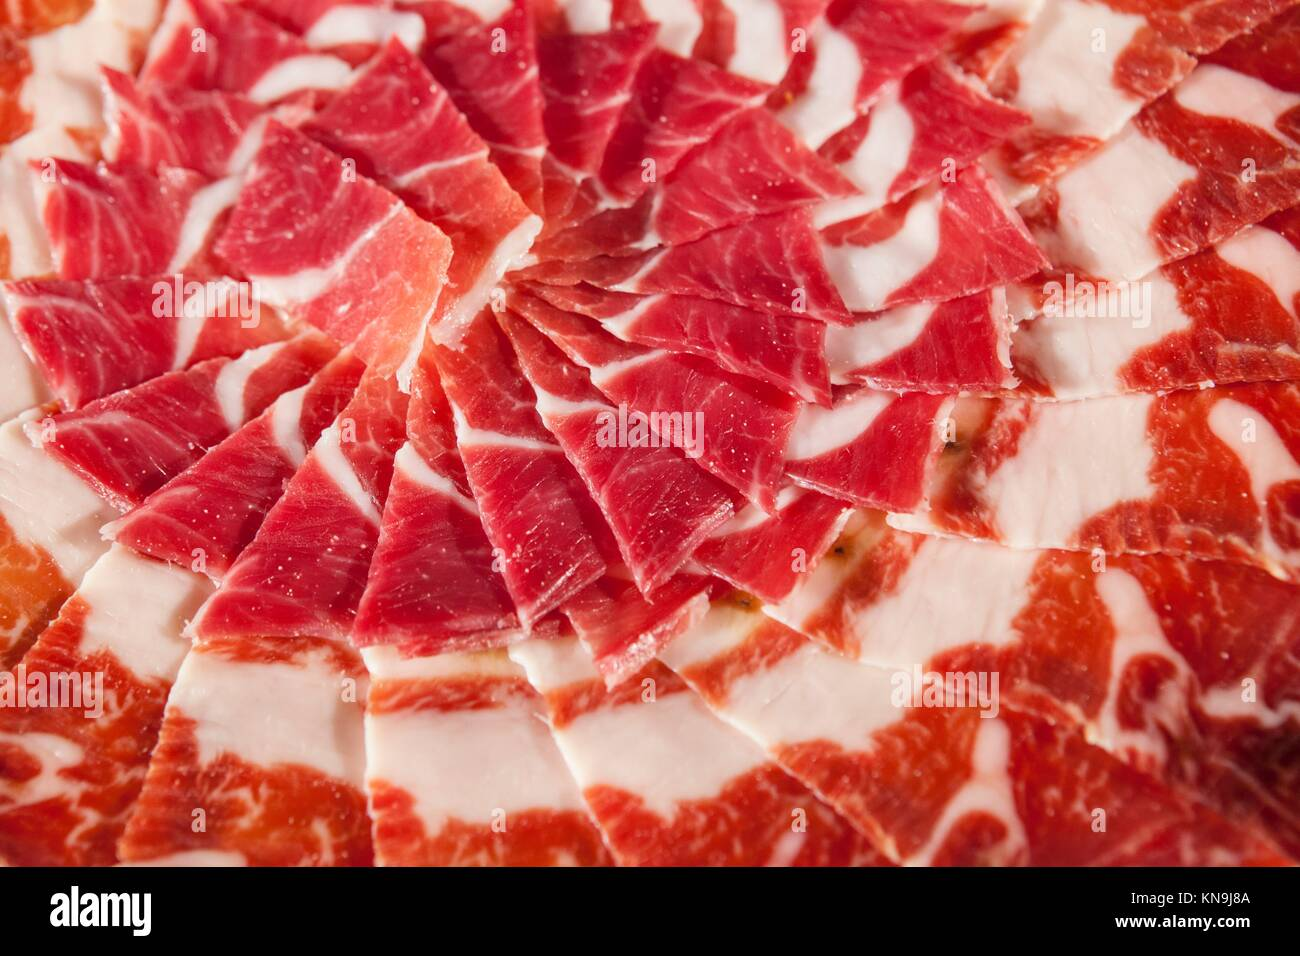 Circular decorative arrangement of iberian cured ham on plate. Selective focus point. Stock Photo